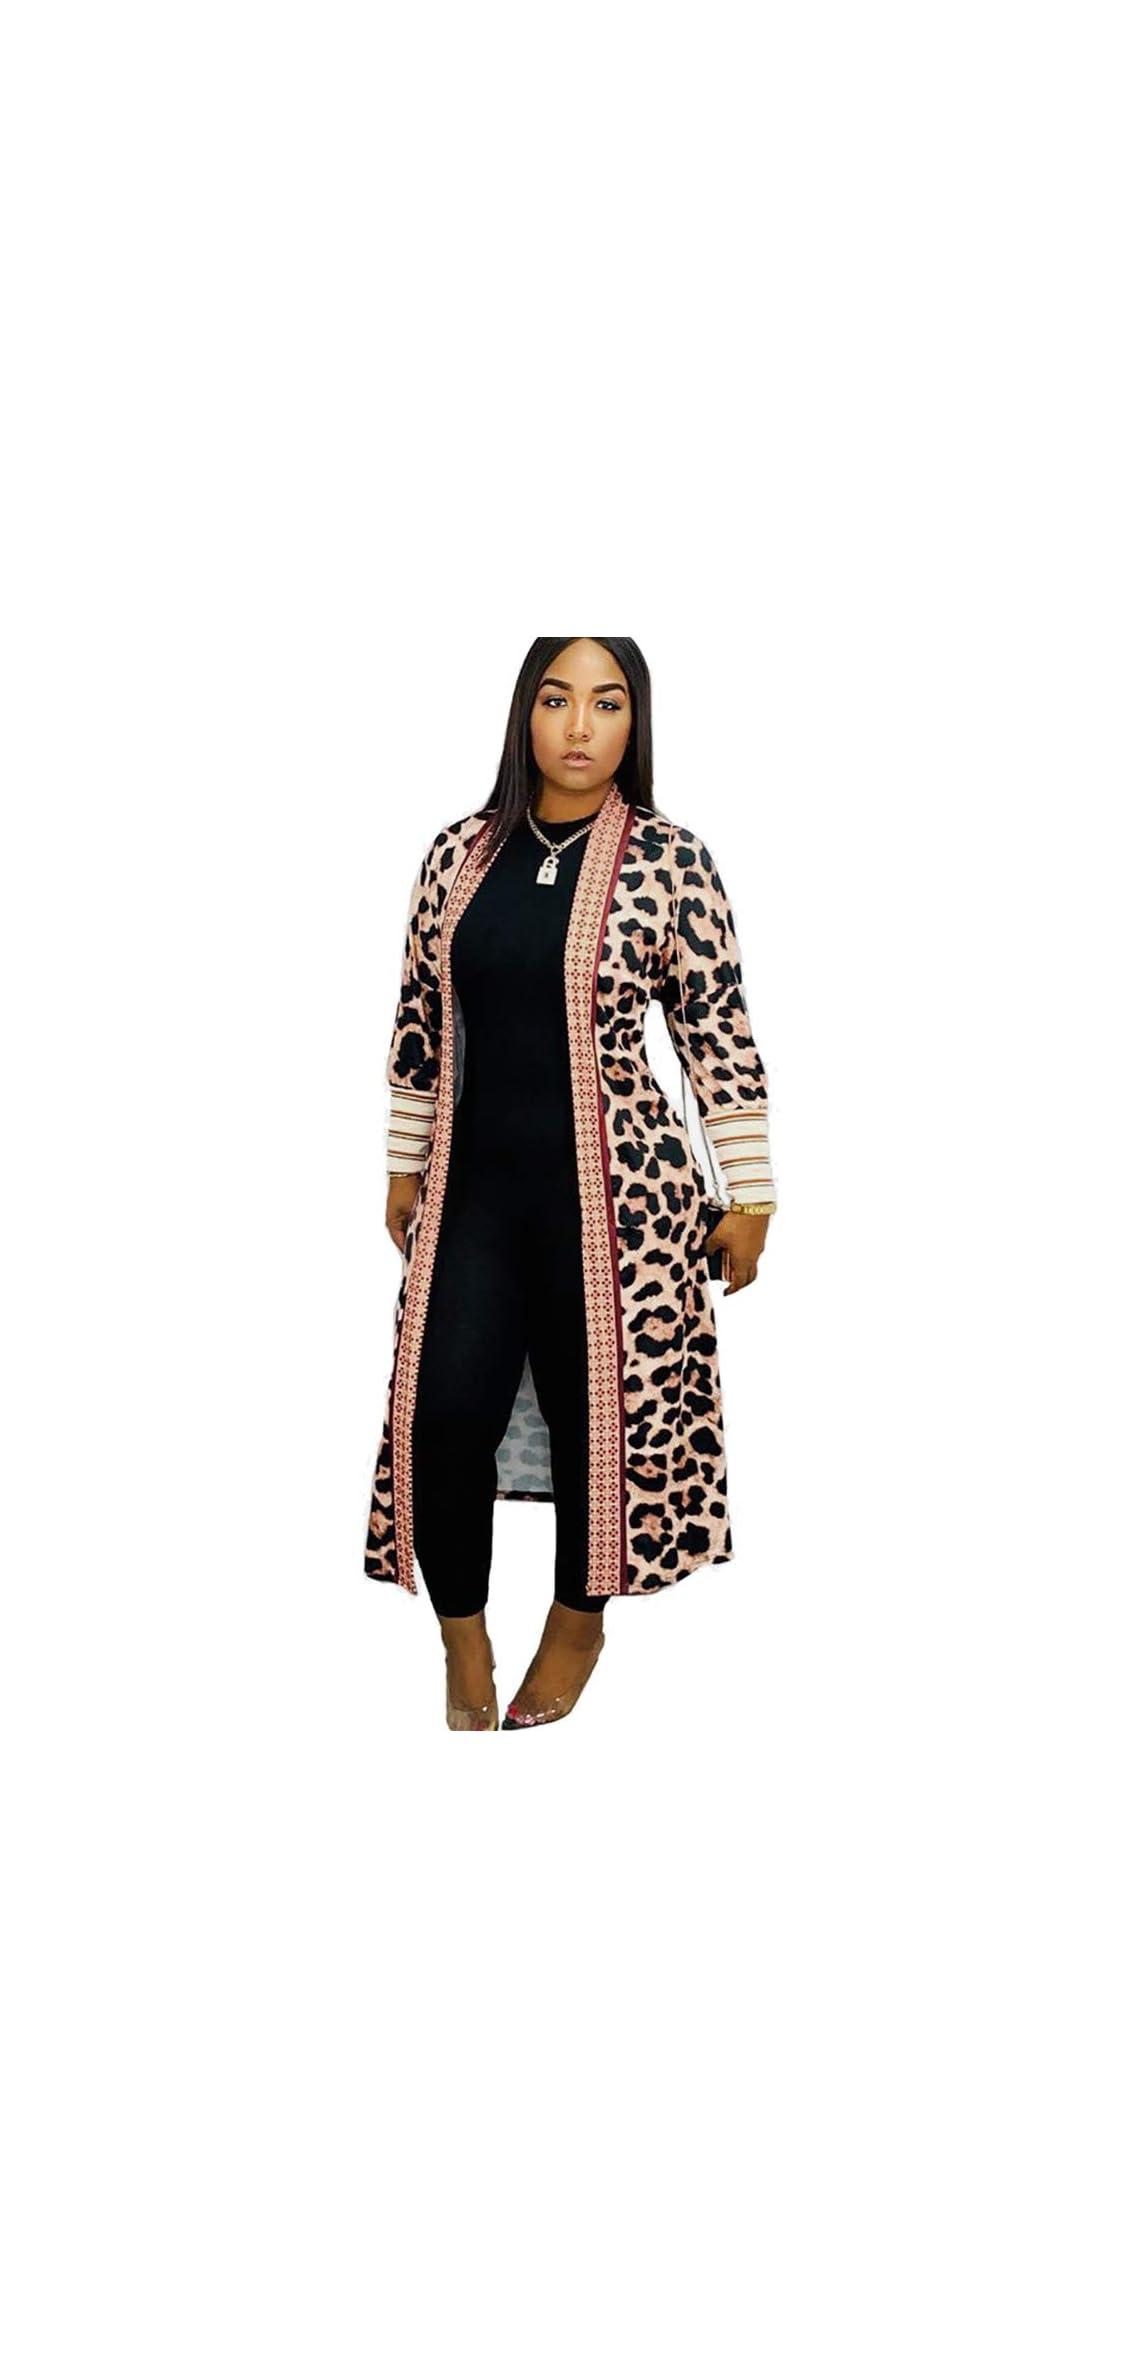 Long Cardigan For Women Lightweight Open Front Jacket Coat